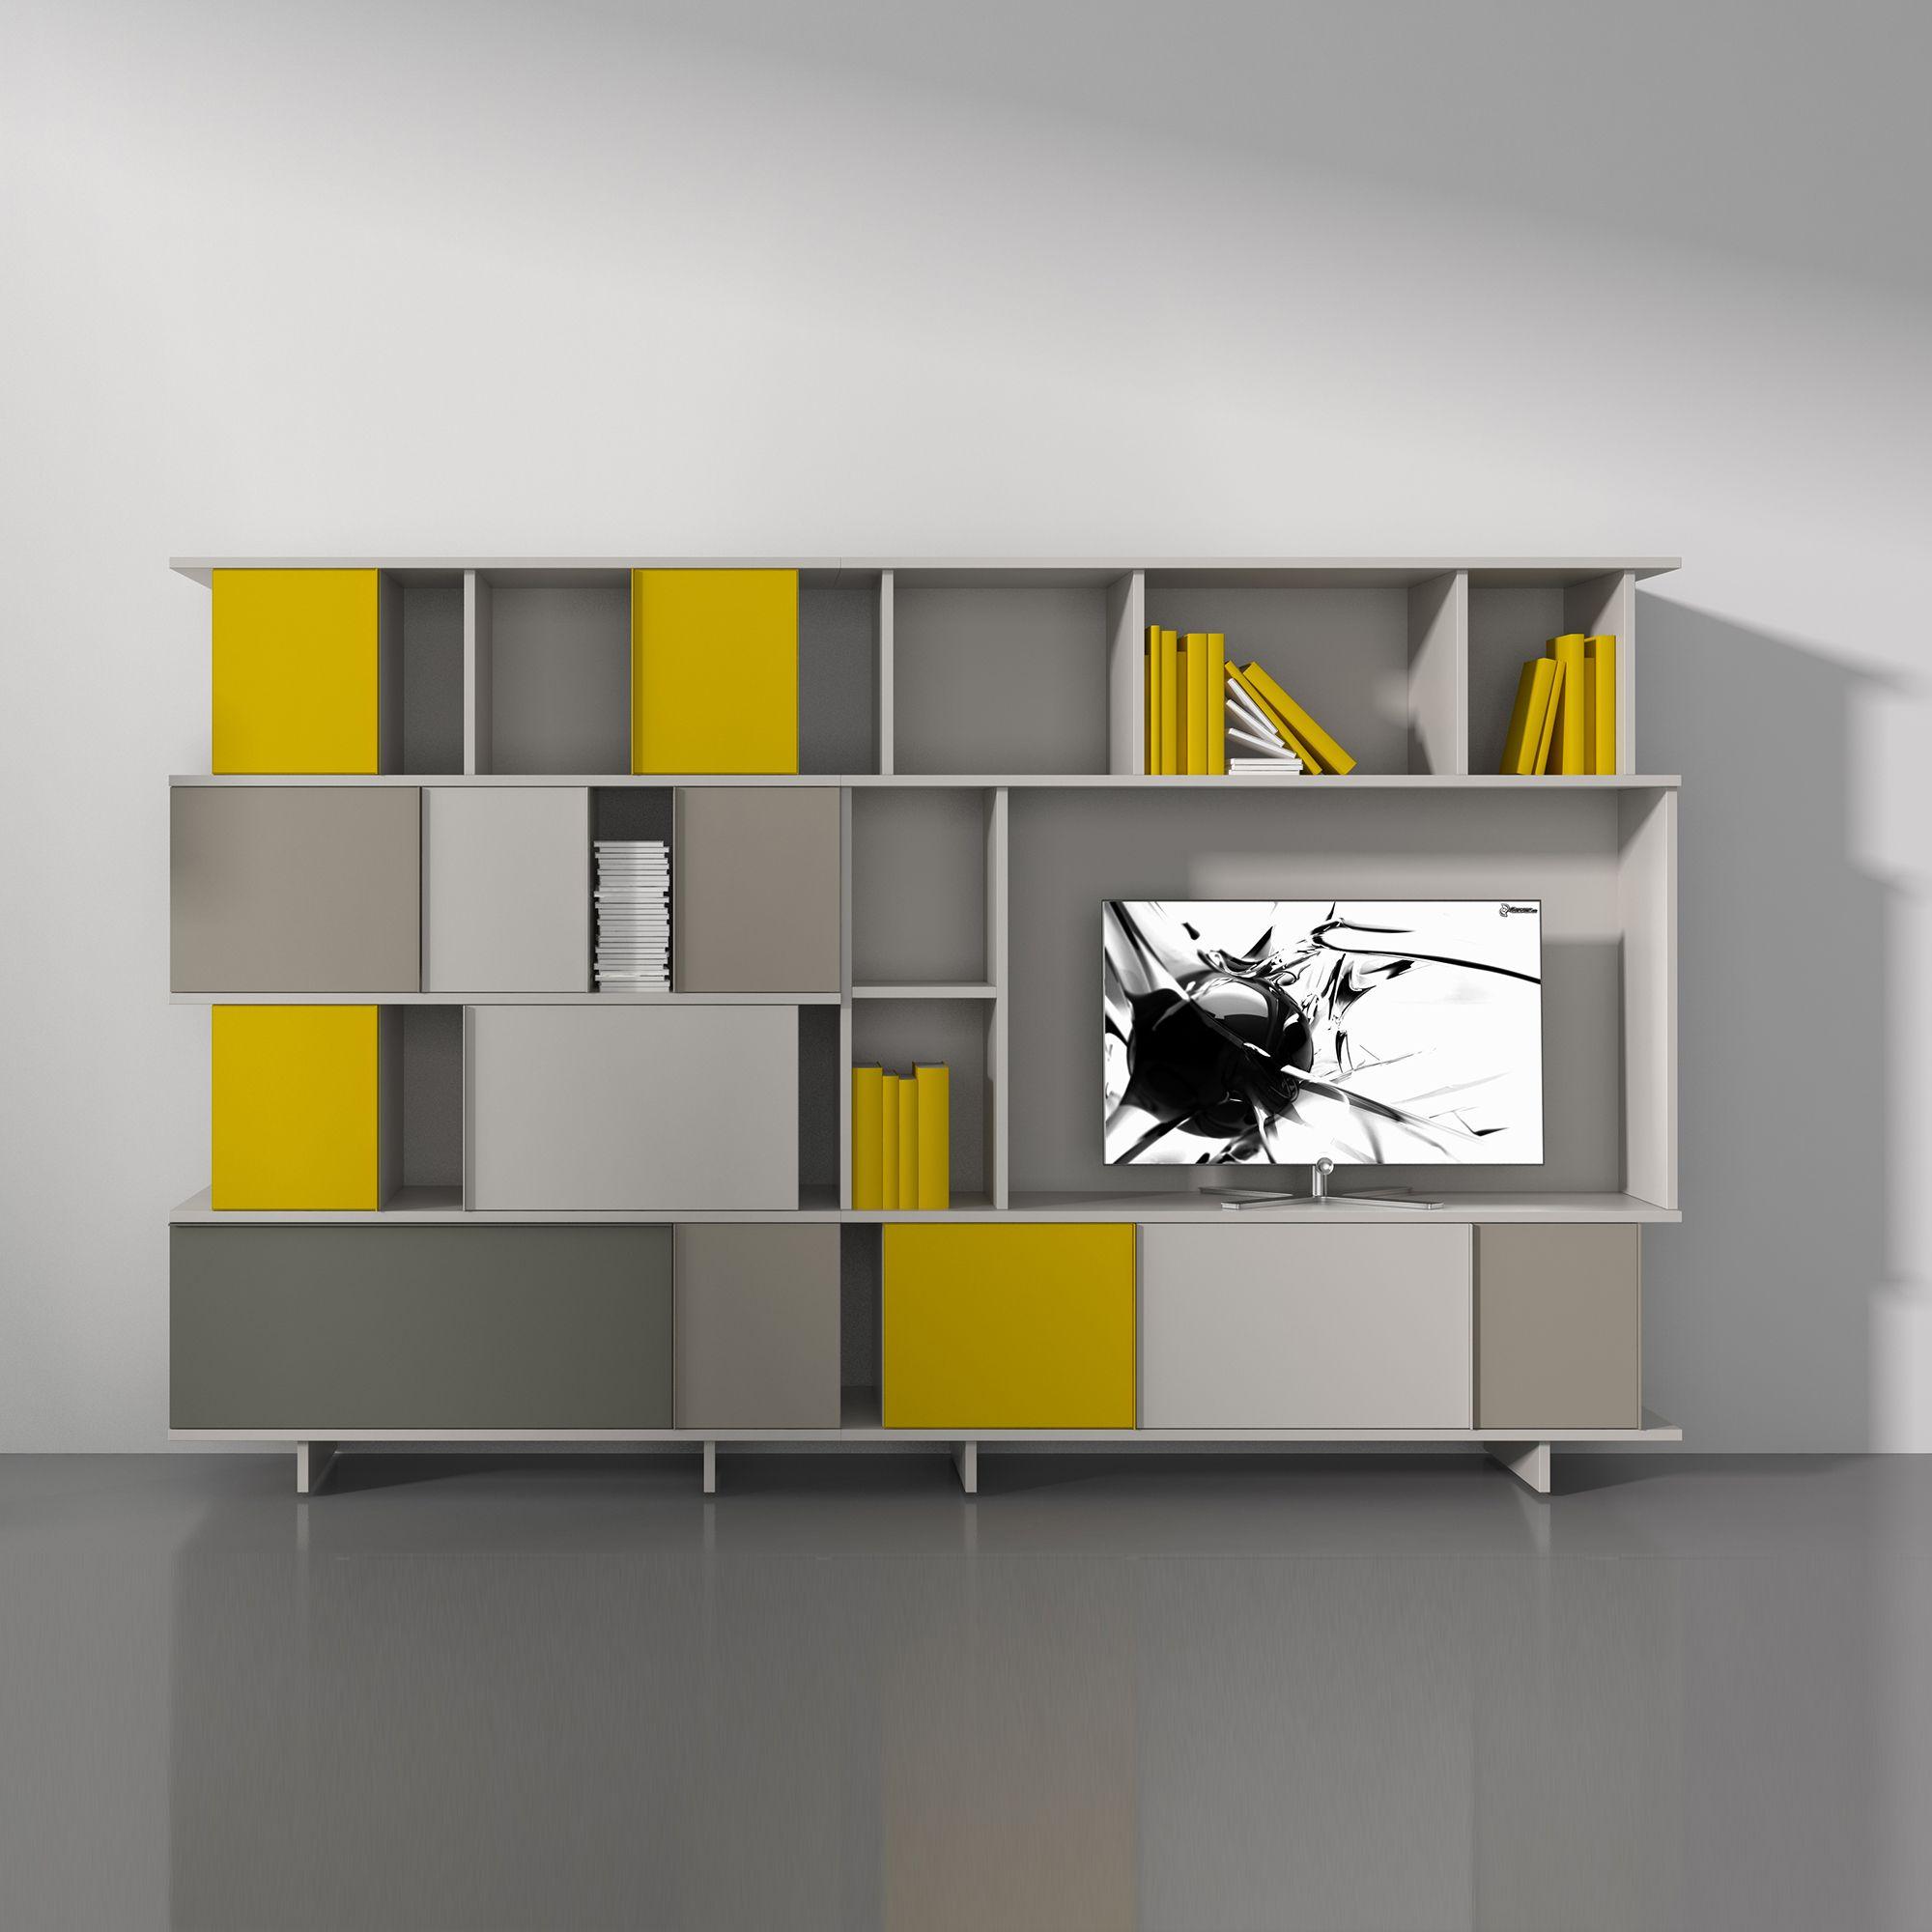 Ziggurat, Yellow, White, Grey Design. Minimalistic Square